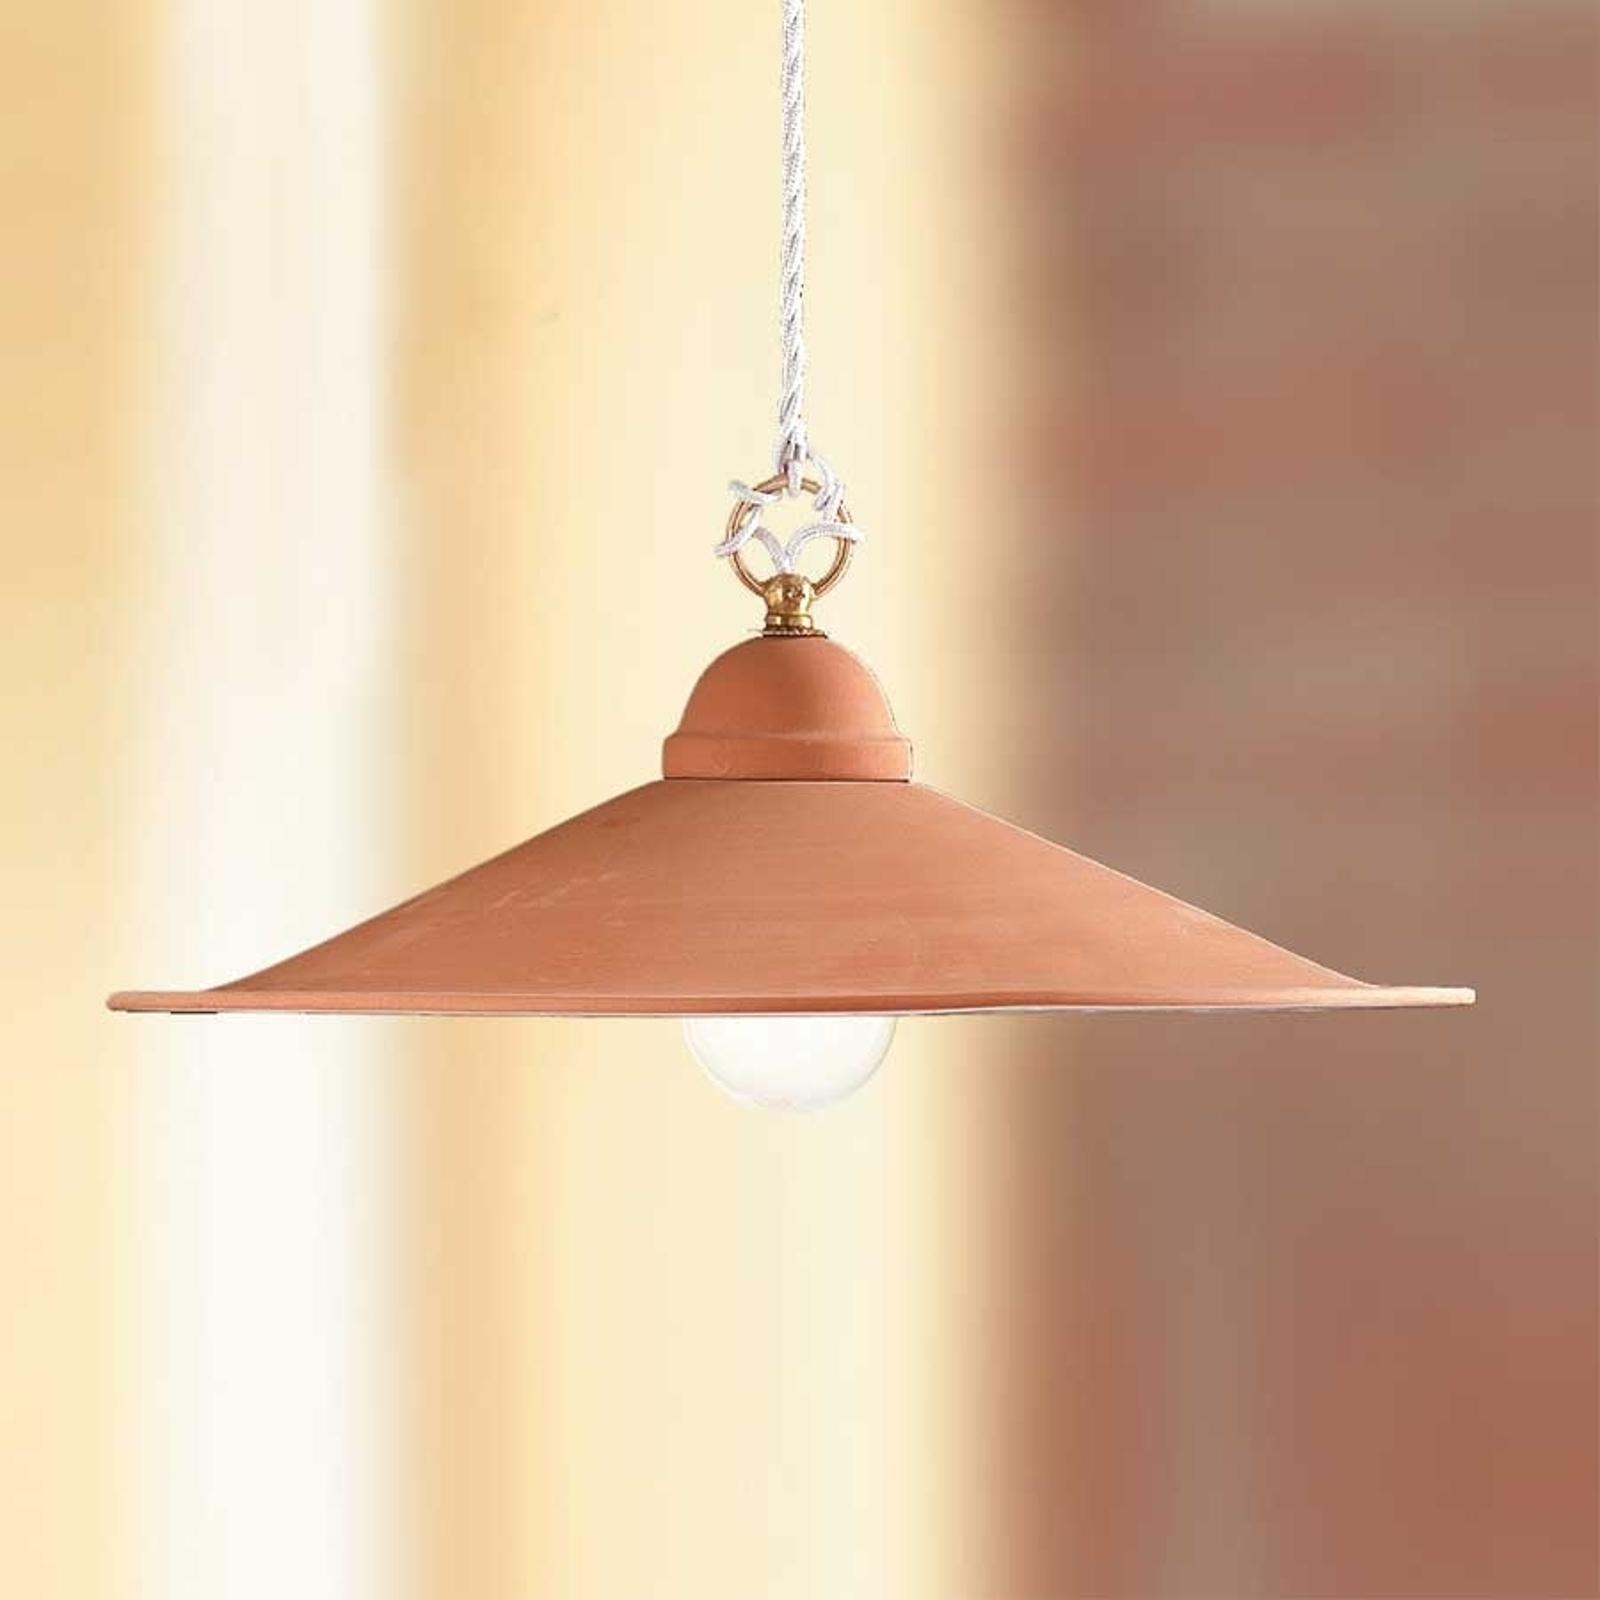 Závesná lampa GIULIA s keramickým tienidlom_2013010_1